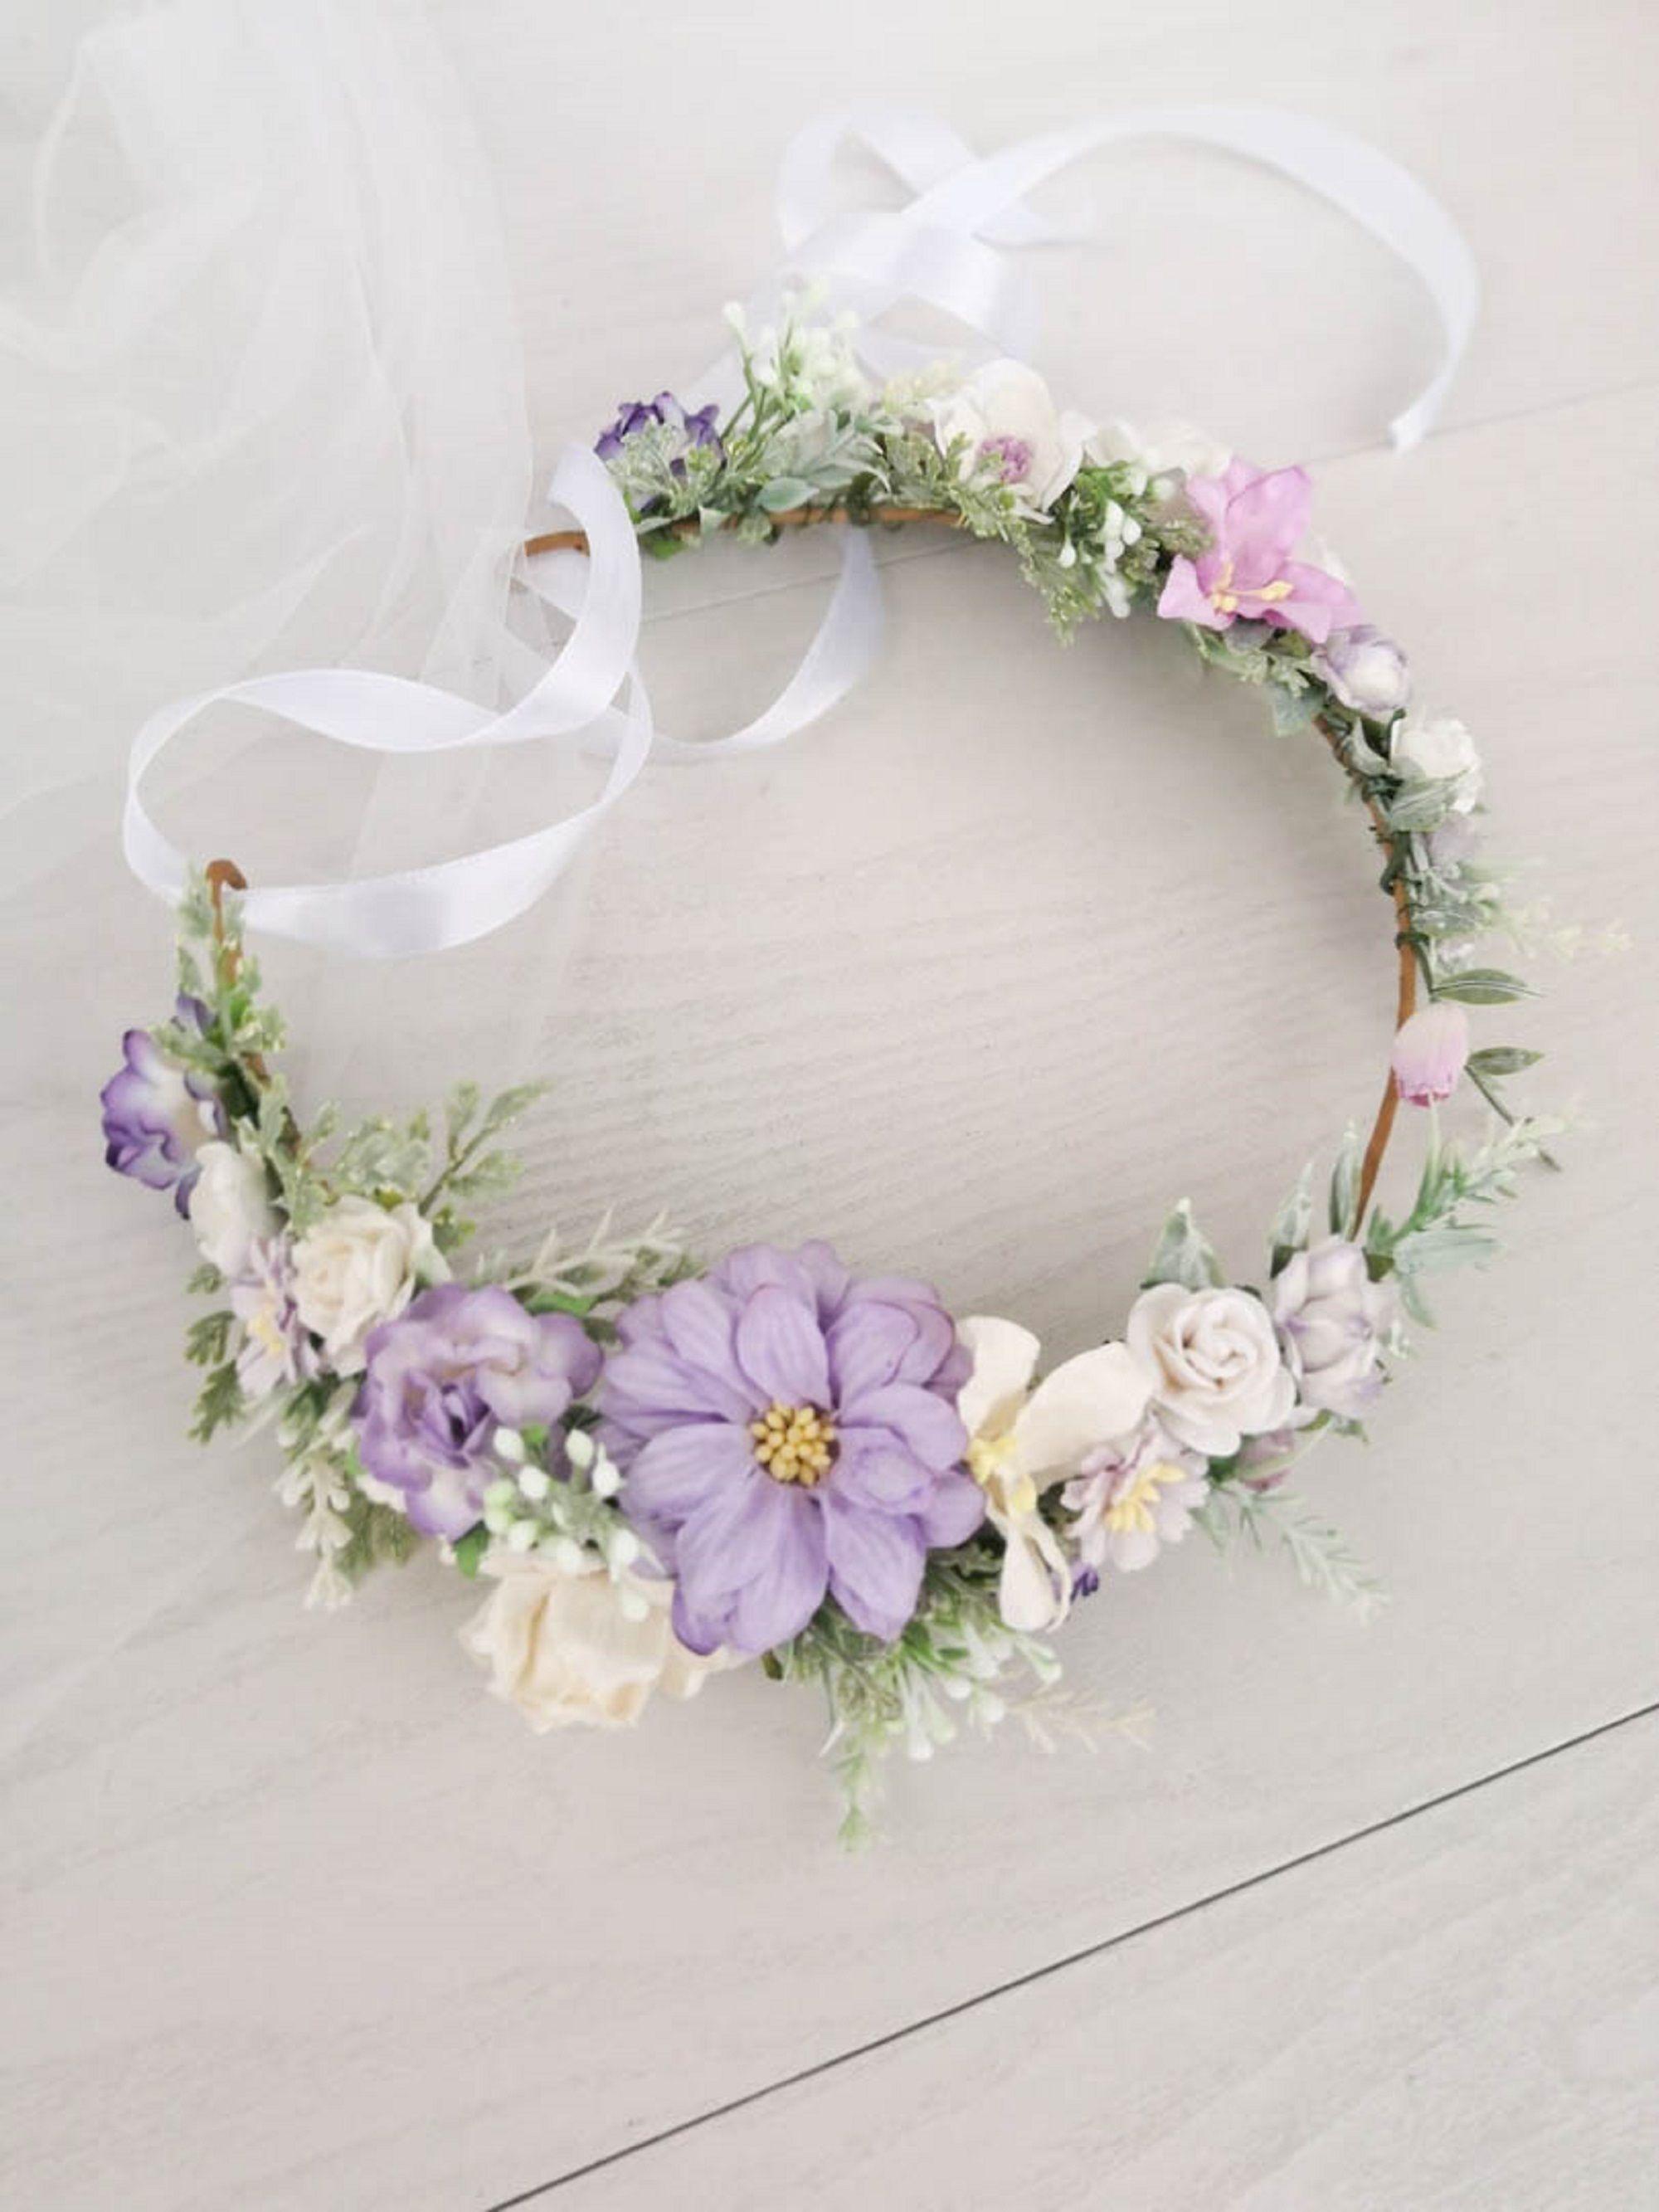 Purple lavender crown bridal flower crown wedding hair accessories headpiece floral wreath boho rustic bridal wreath lavender hair piece